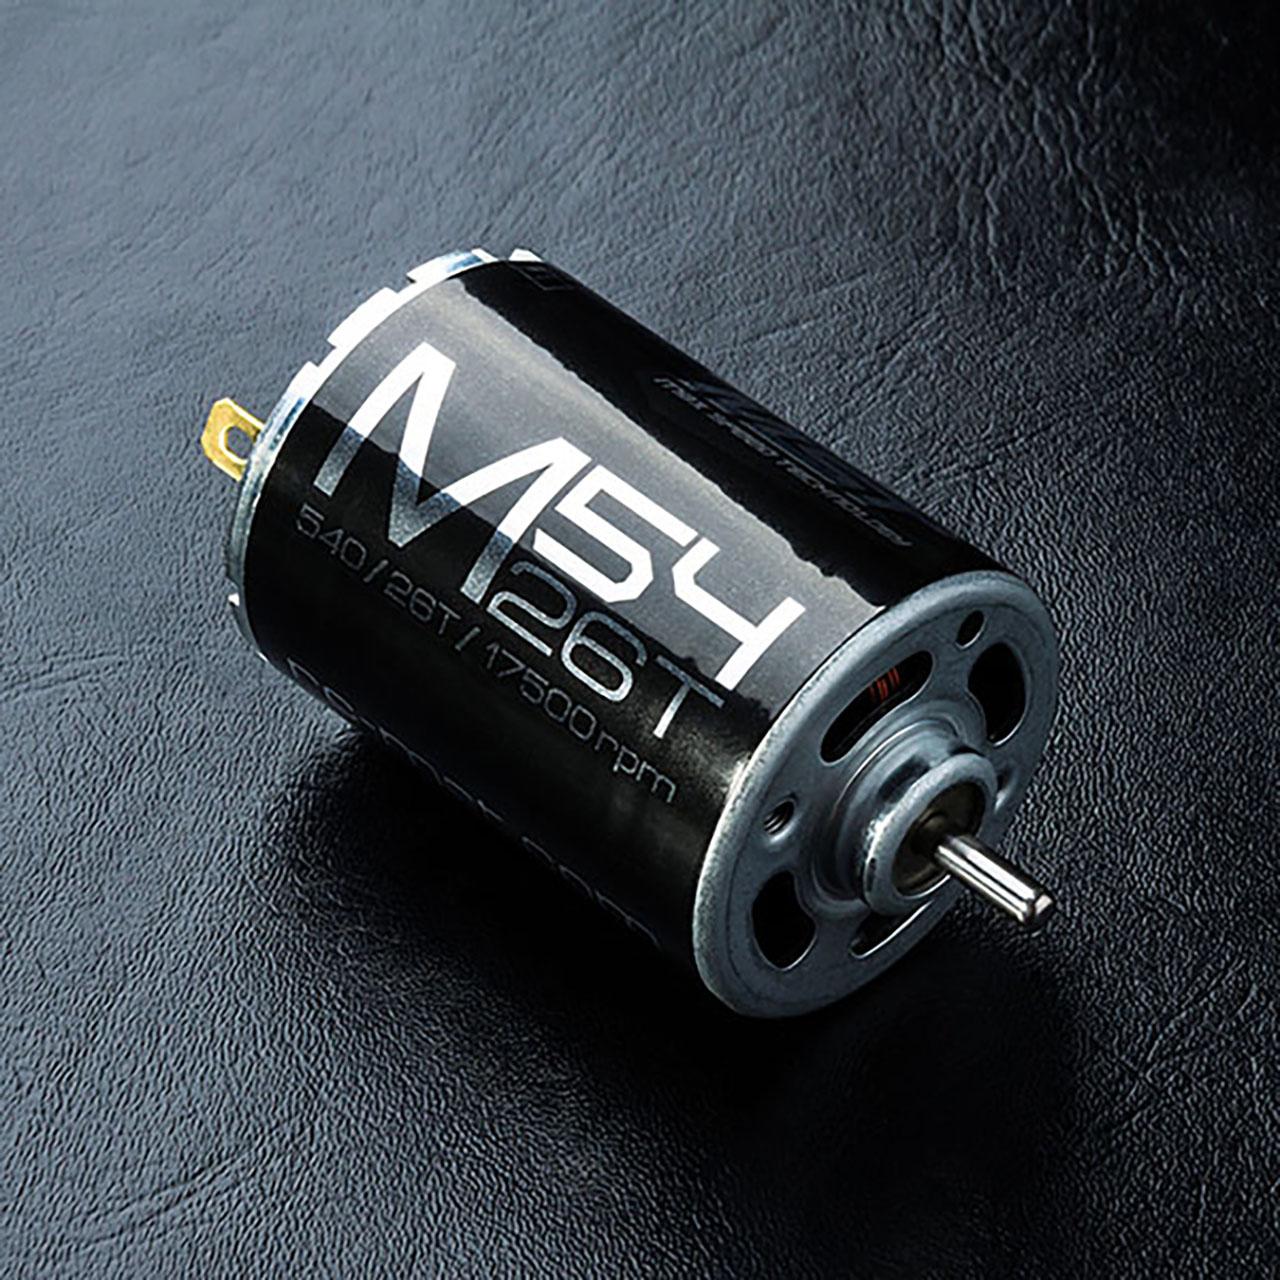 MST Moteur Mabushi charbon 26T, MST601010